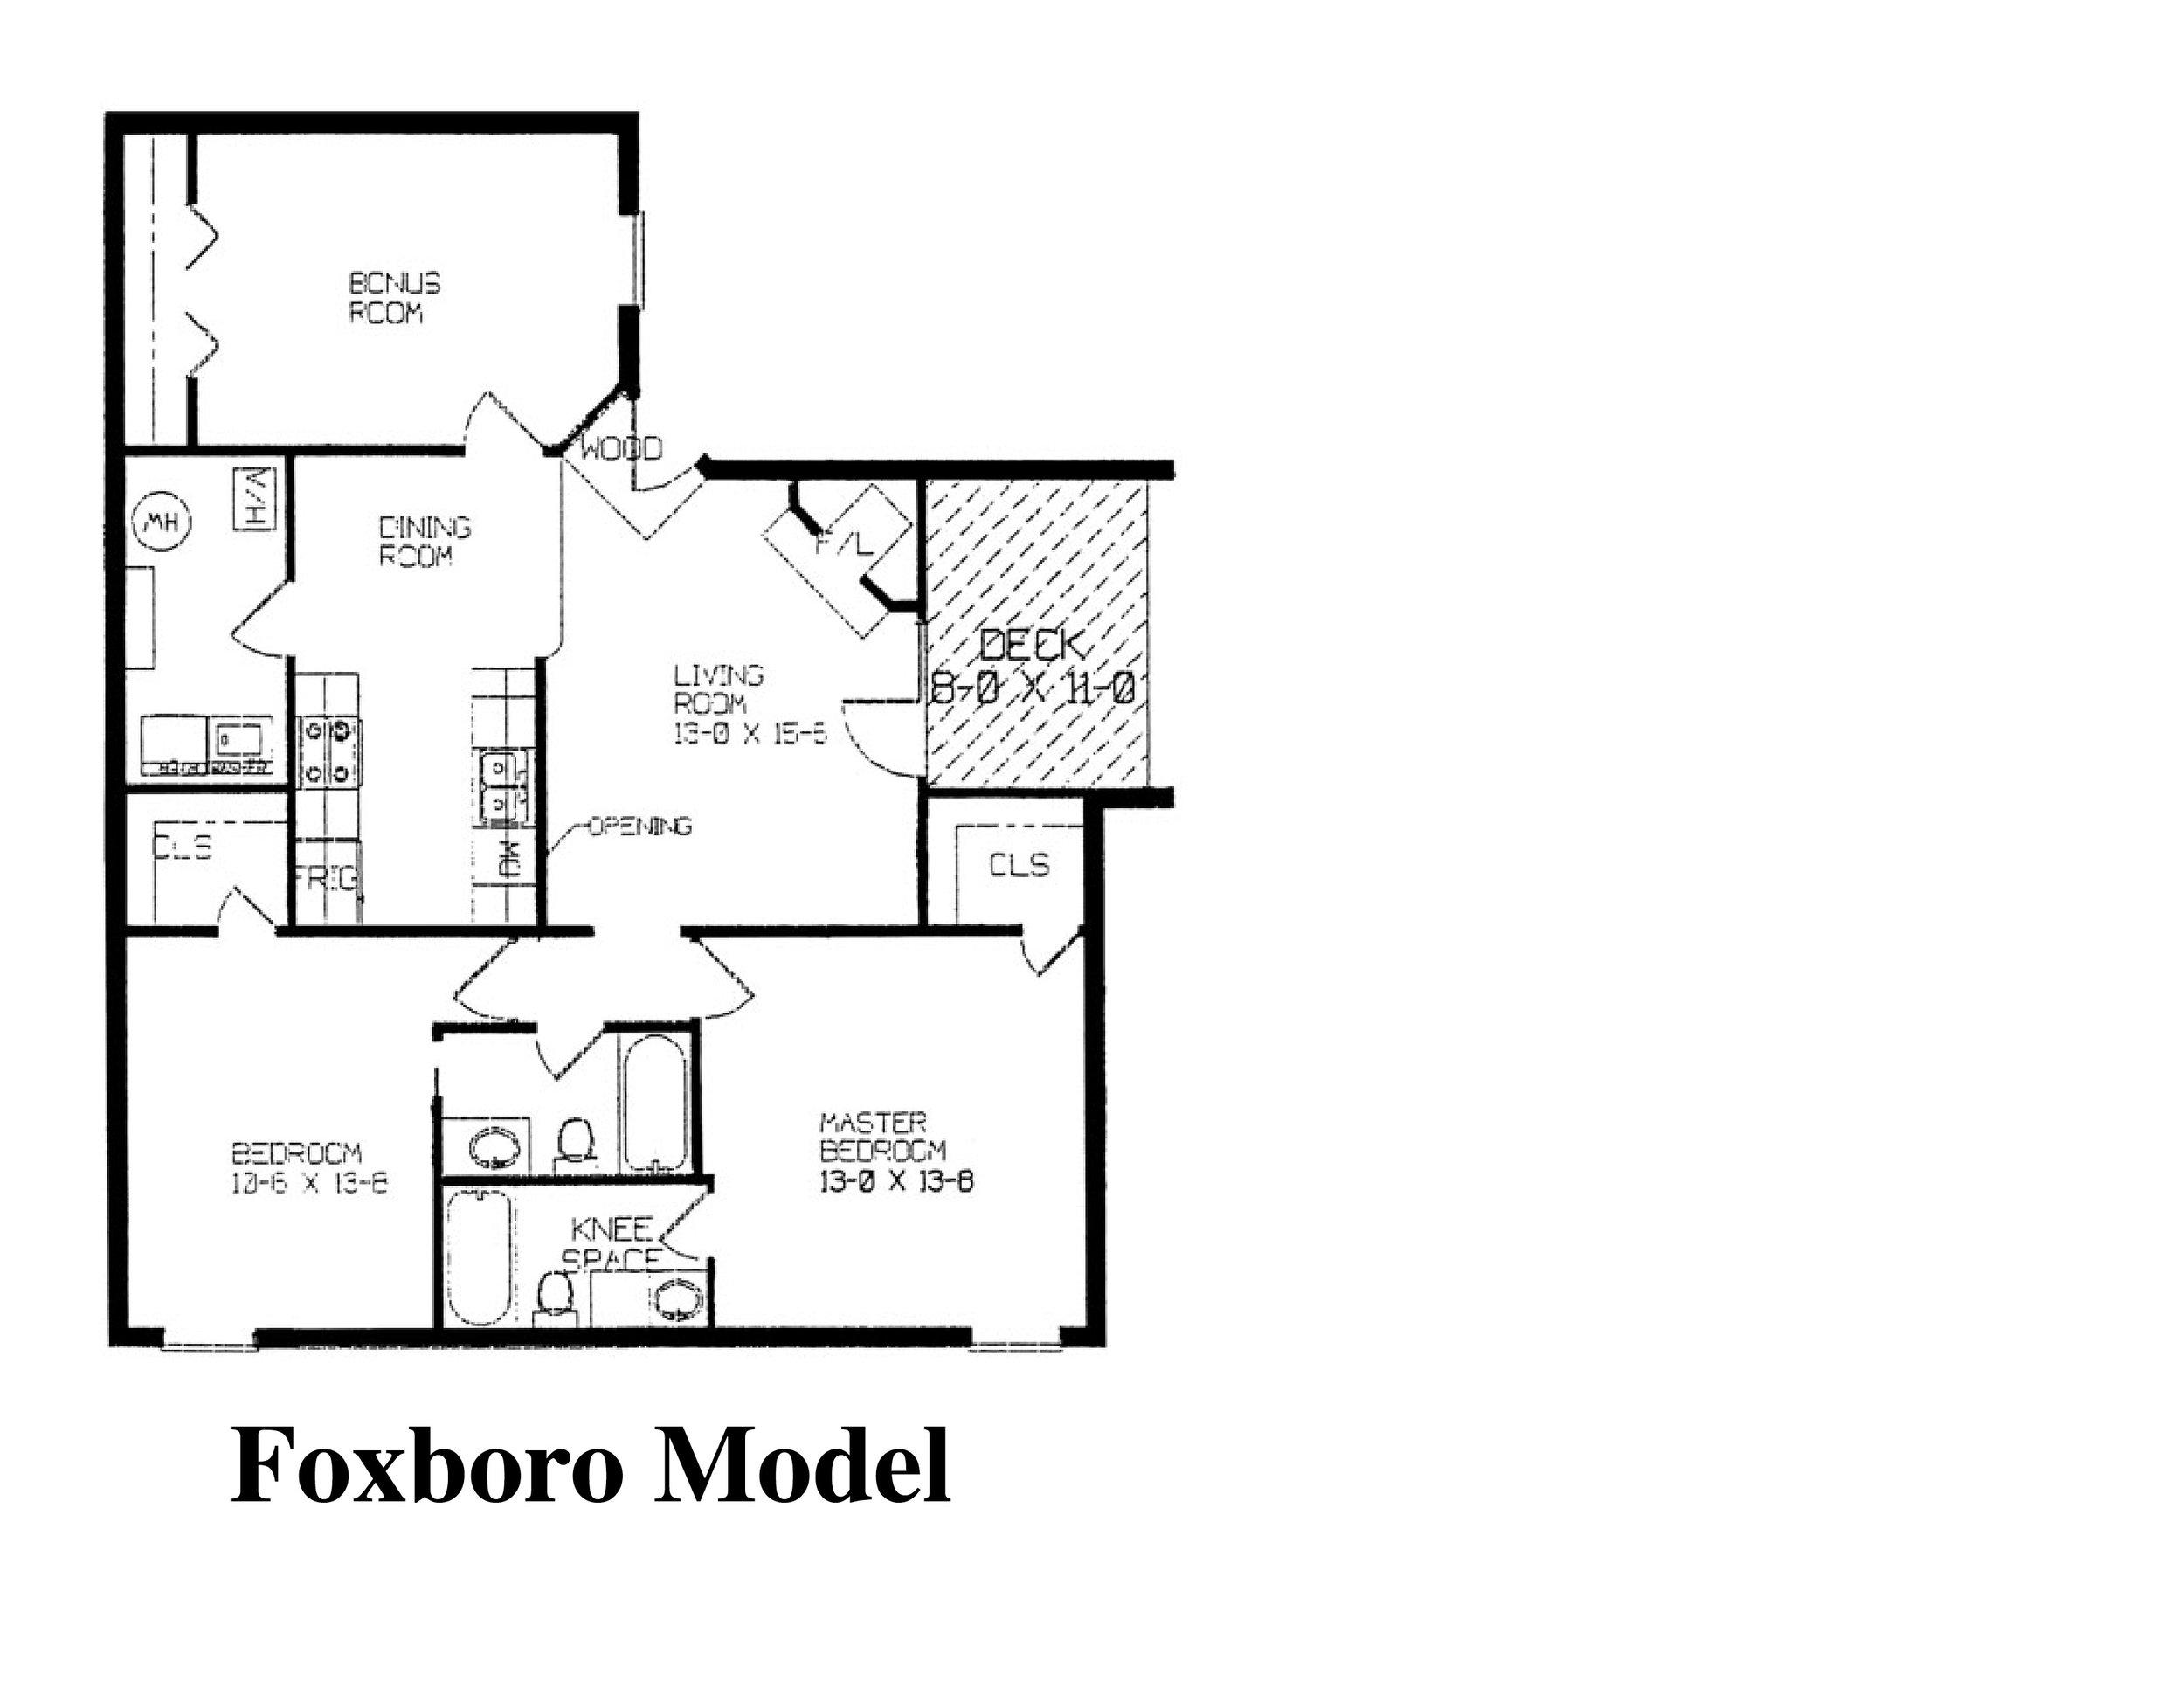 Foxboro Floorplan edited.jpg